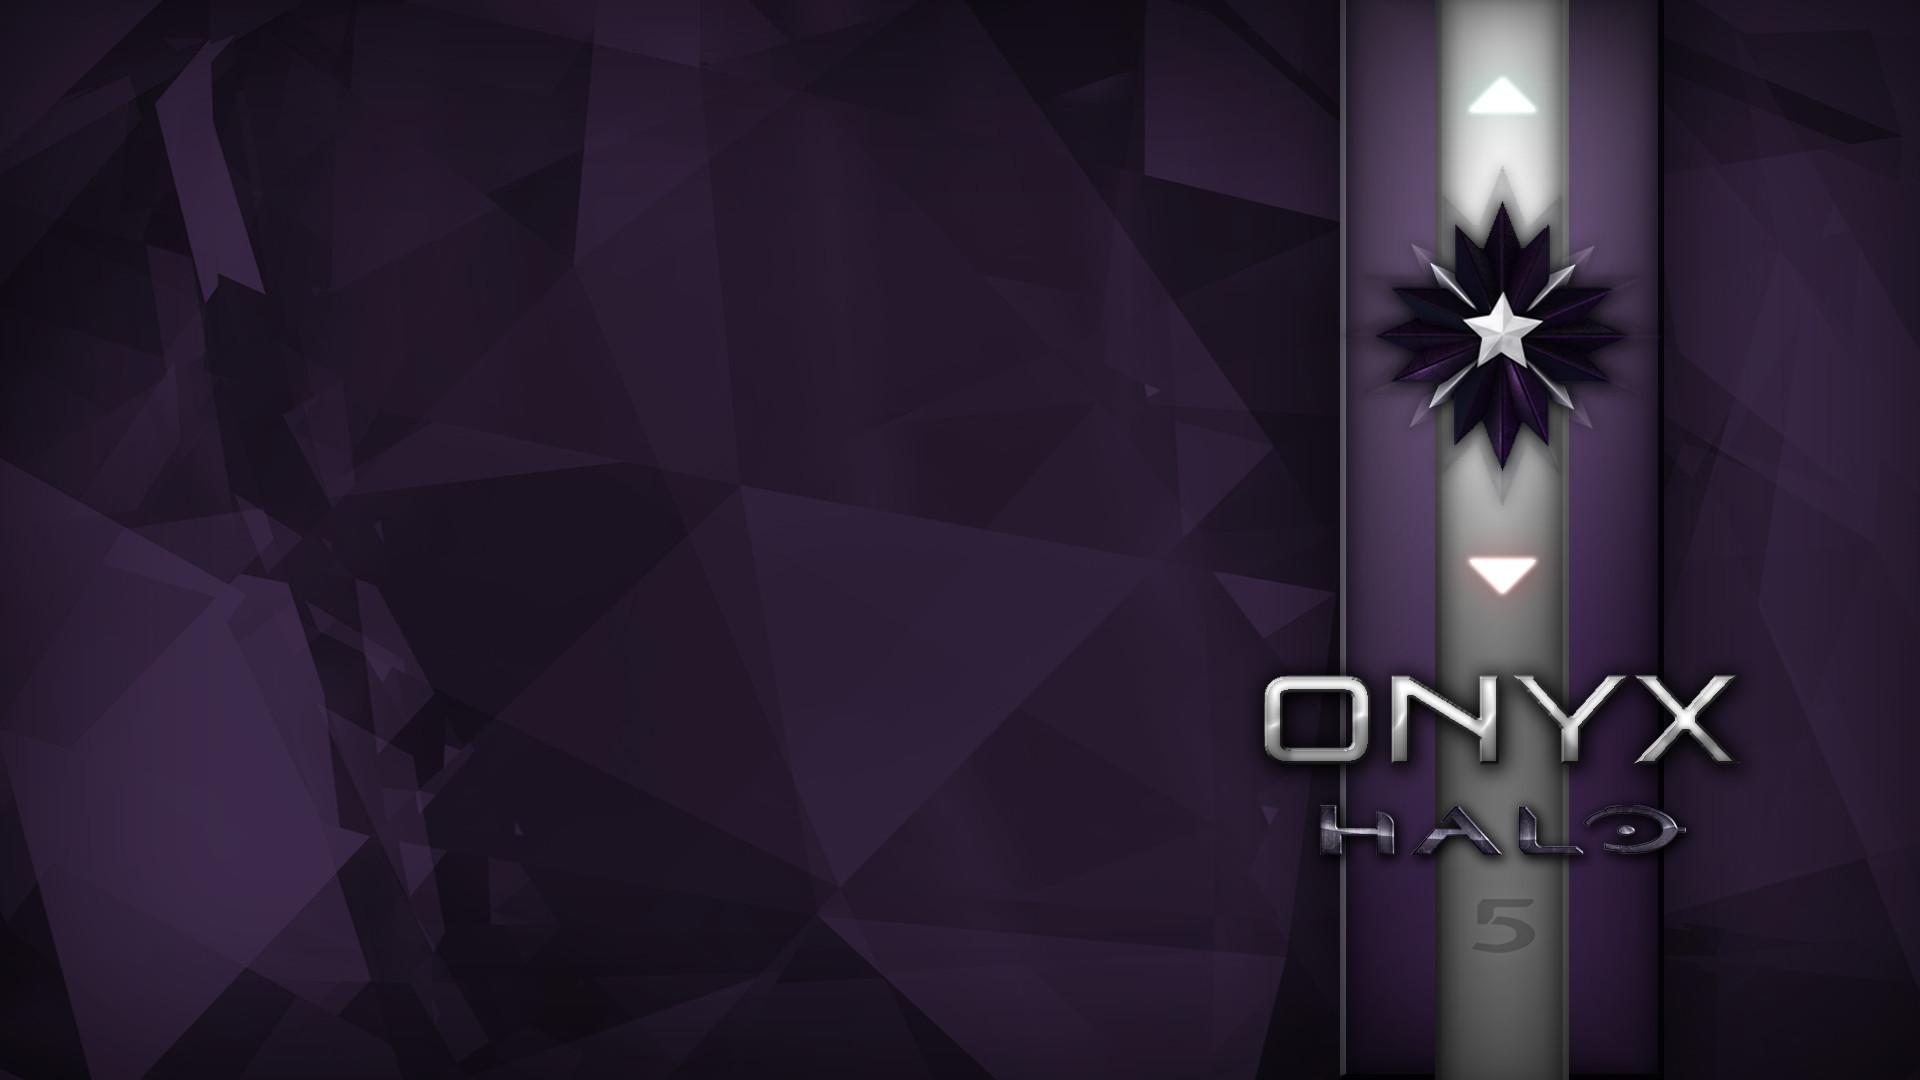 Halo 5 ONYX Rank Background I made (1920×1080) Need #iPhone #6S #